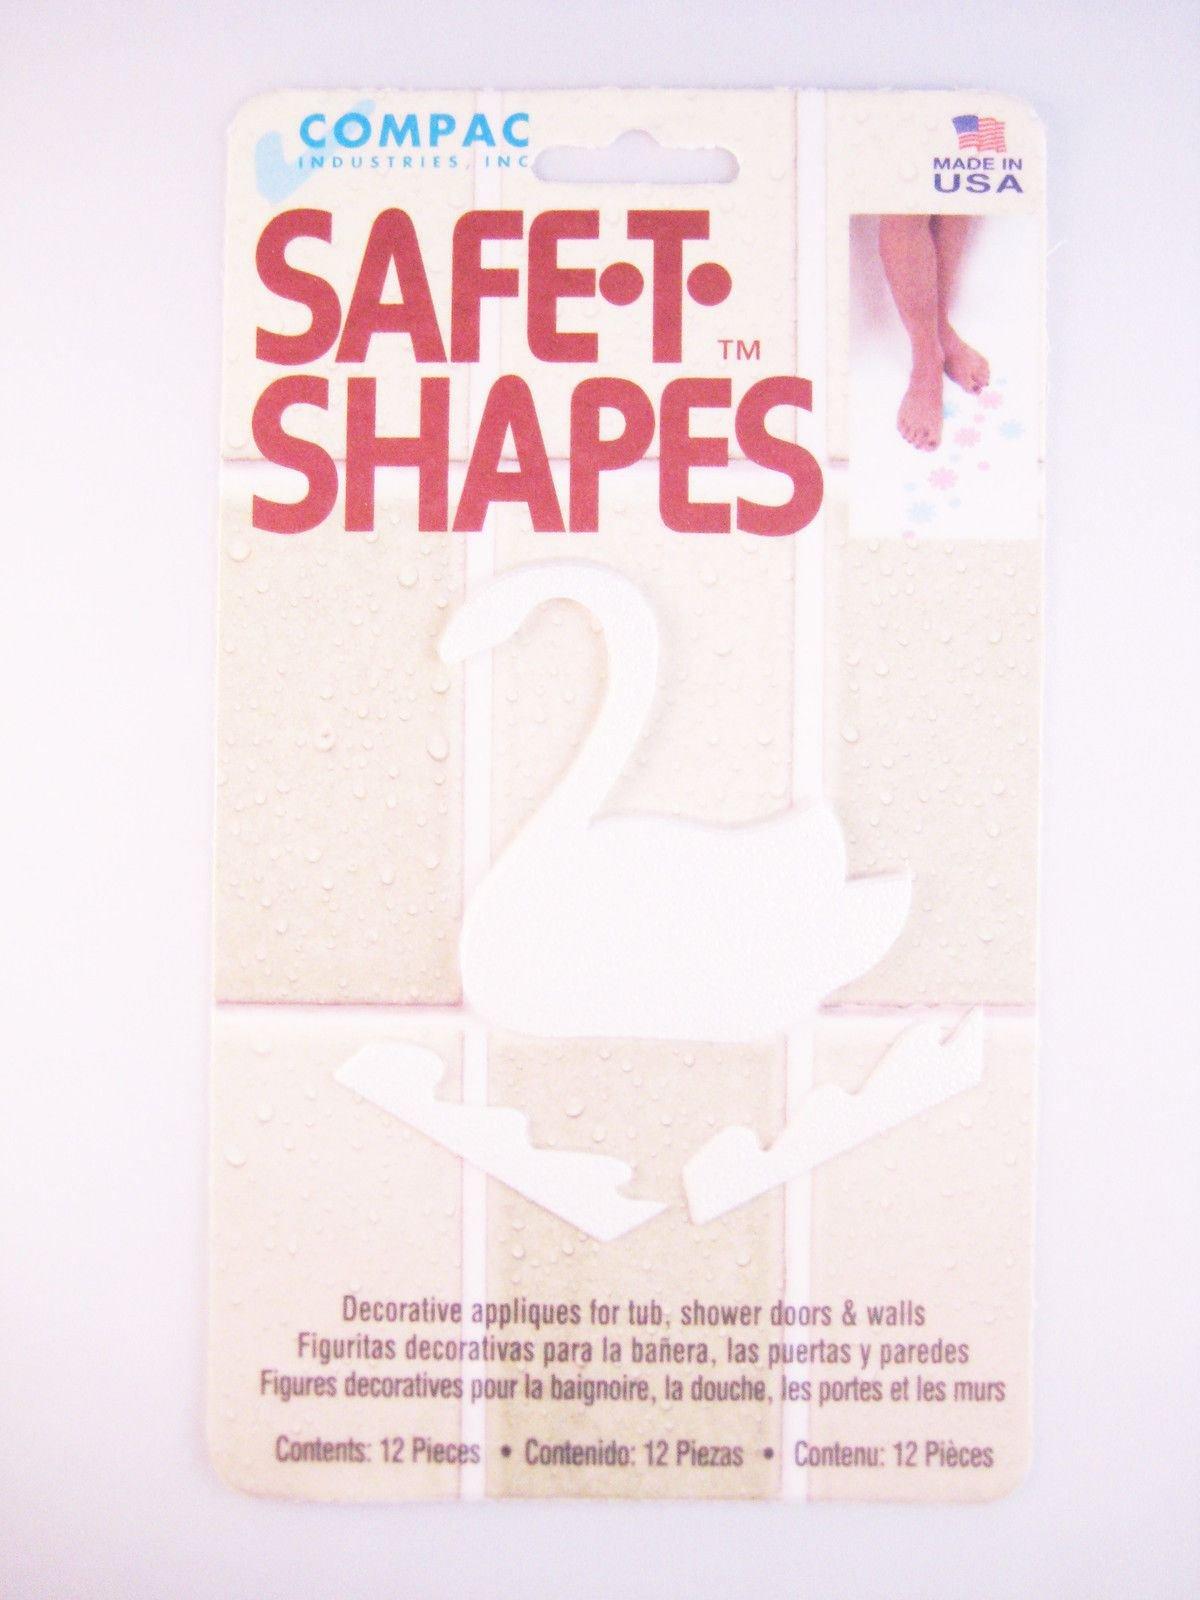 (White Swan) Safe-t-shapes Safety Applique Anti-slip Bath Tub Shower Sticker